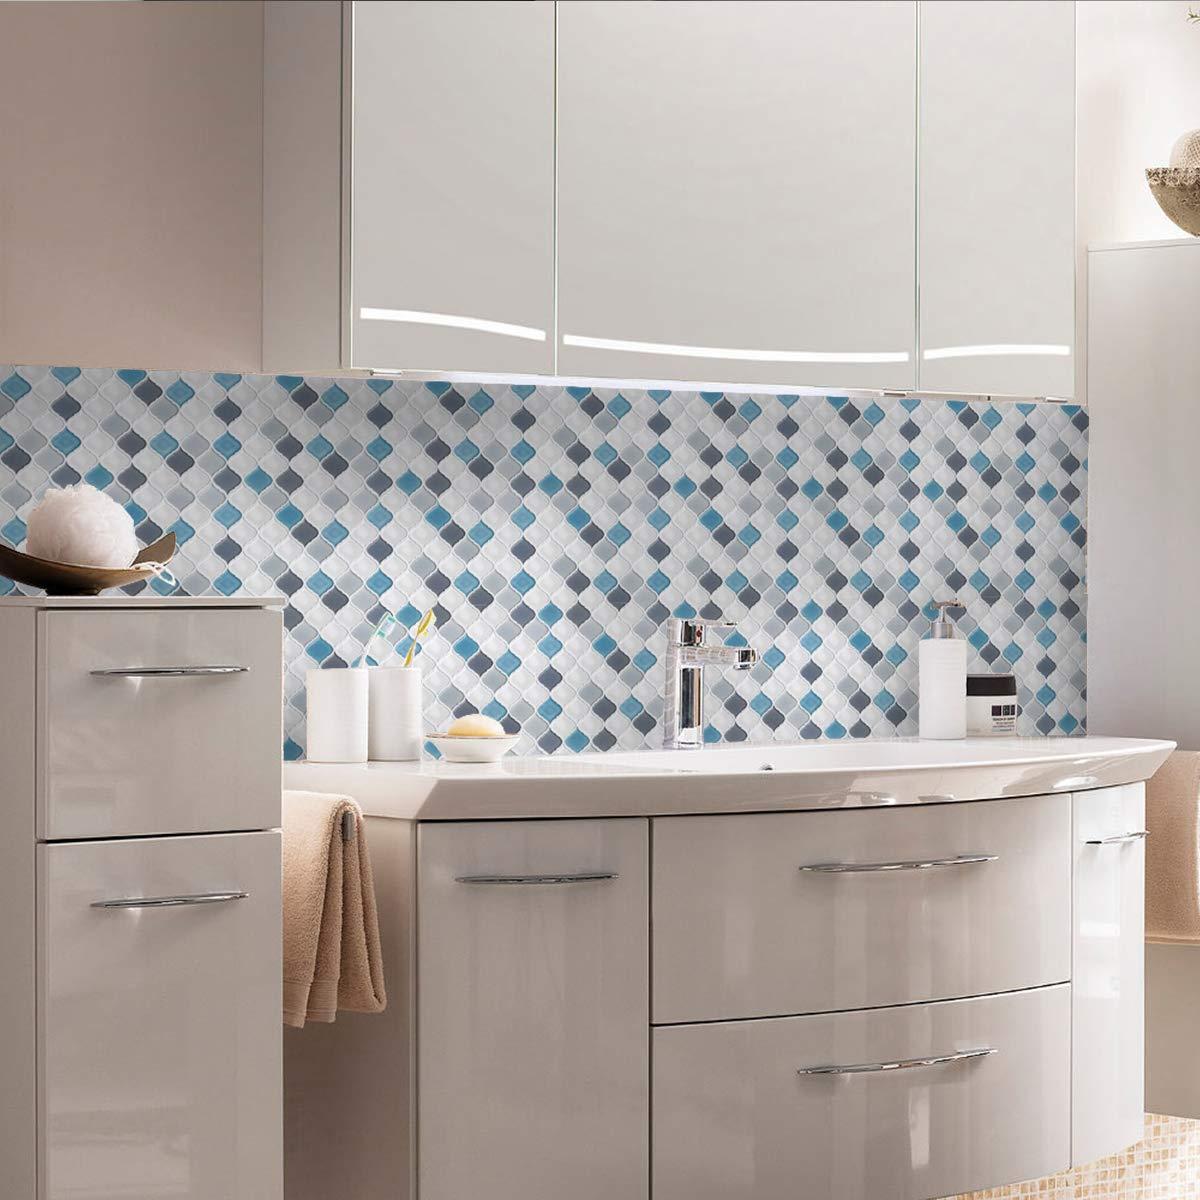 Peel and Stick Wall Tile for Kitchen Backsplash-Slant Blue&White Arabesque Tile Backsplash-Kitchen Backsplash Tiles Peel and Stick Wall Stickers,6 Sheets by FAM STICKTILES (Image #4)